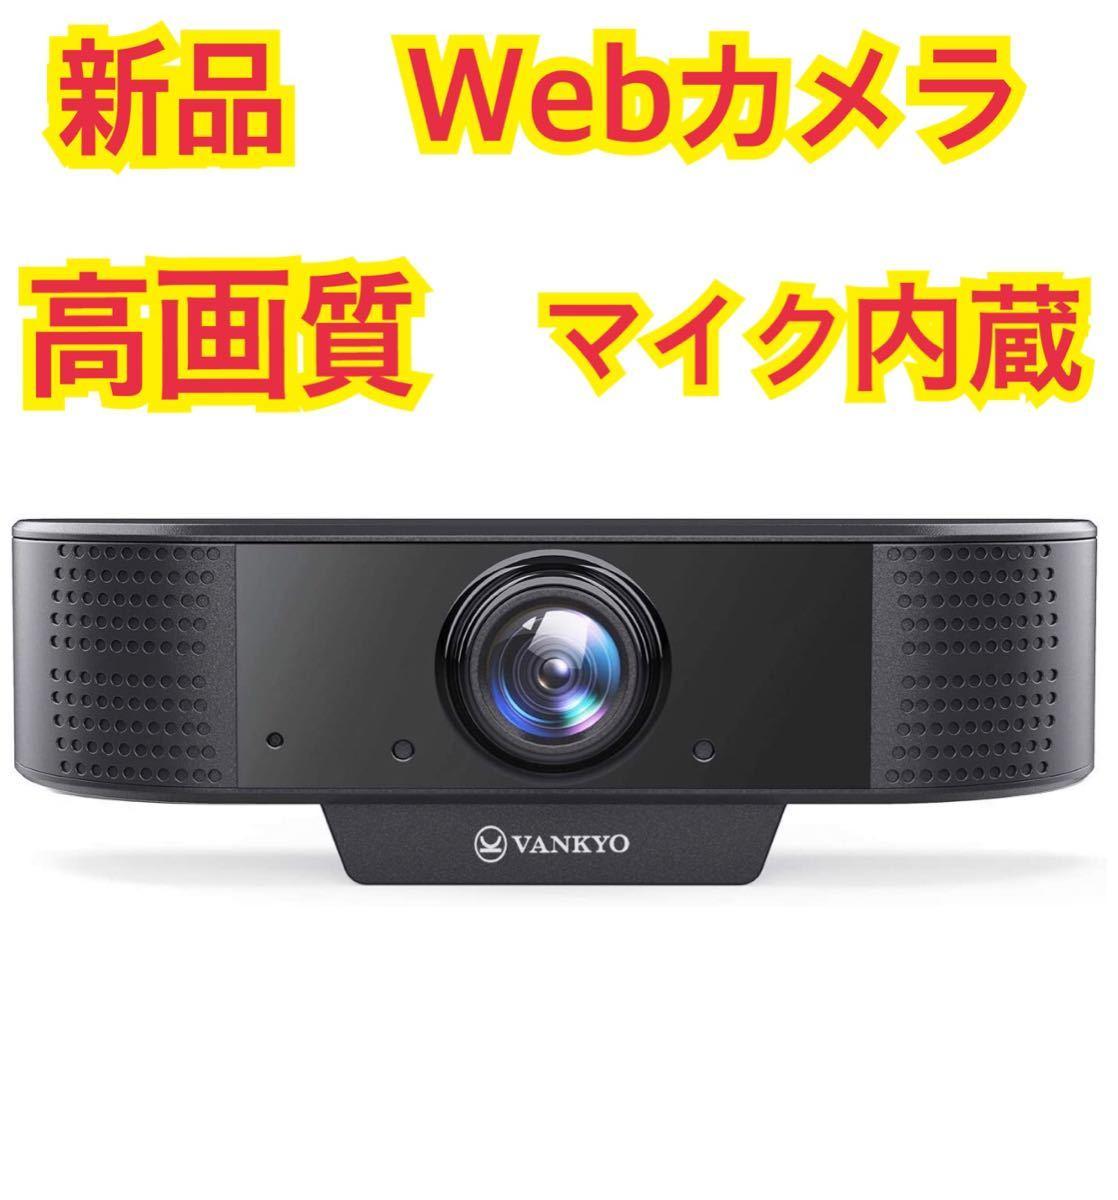 webカメラ マイク内蔵 ウェブカメラ Webカメラ 高画質 パソコンカメラ